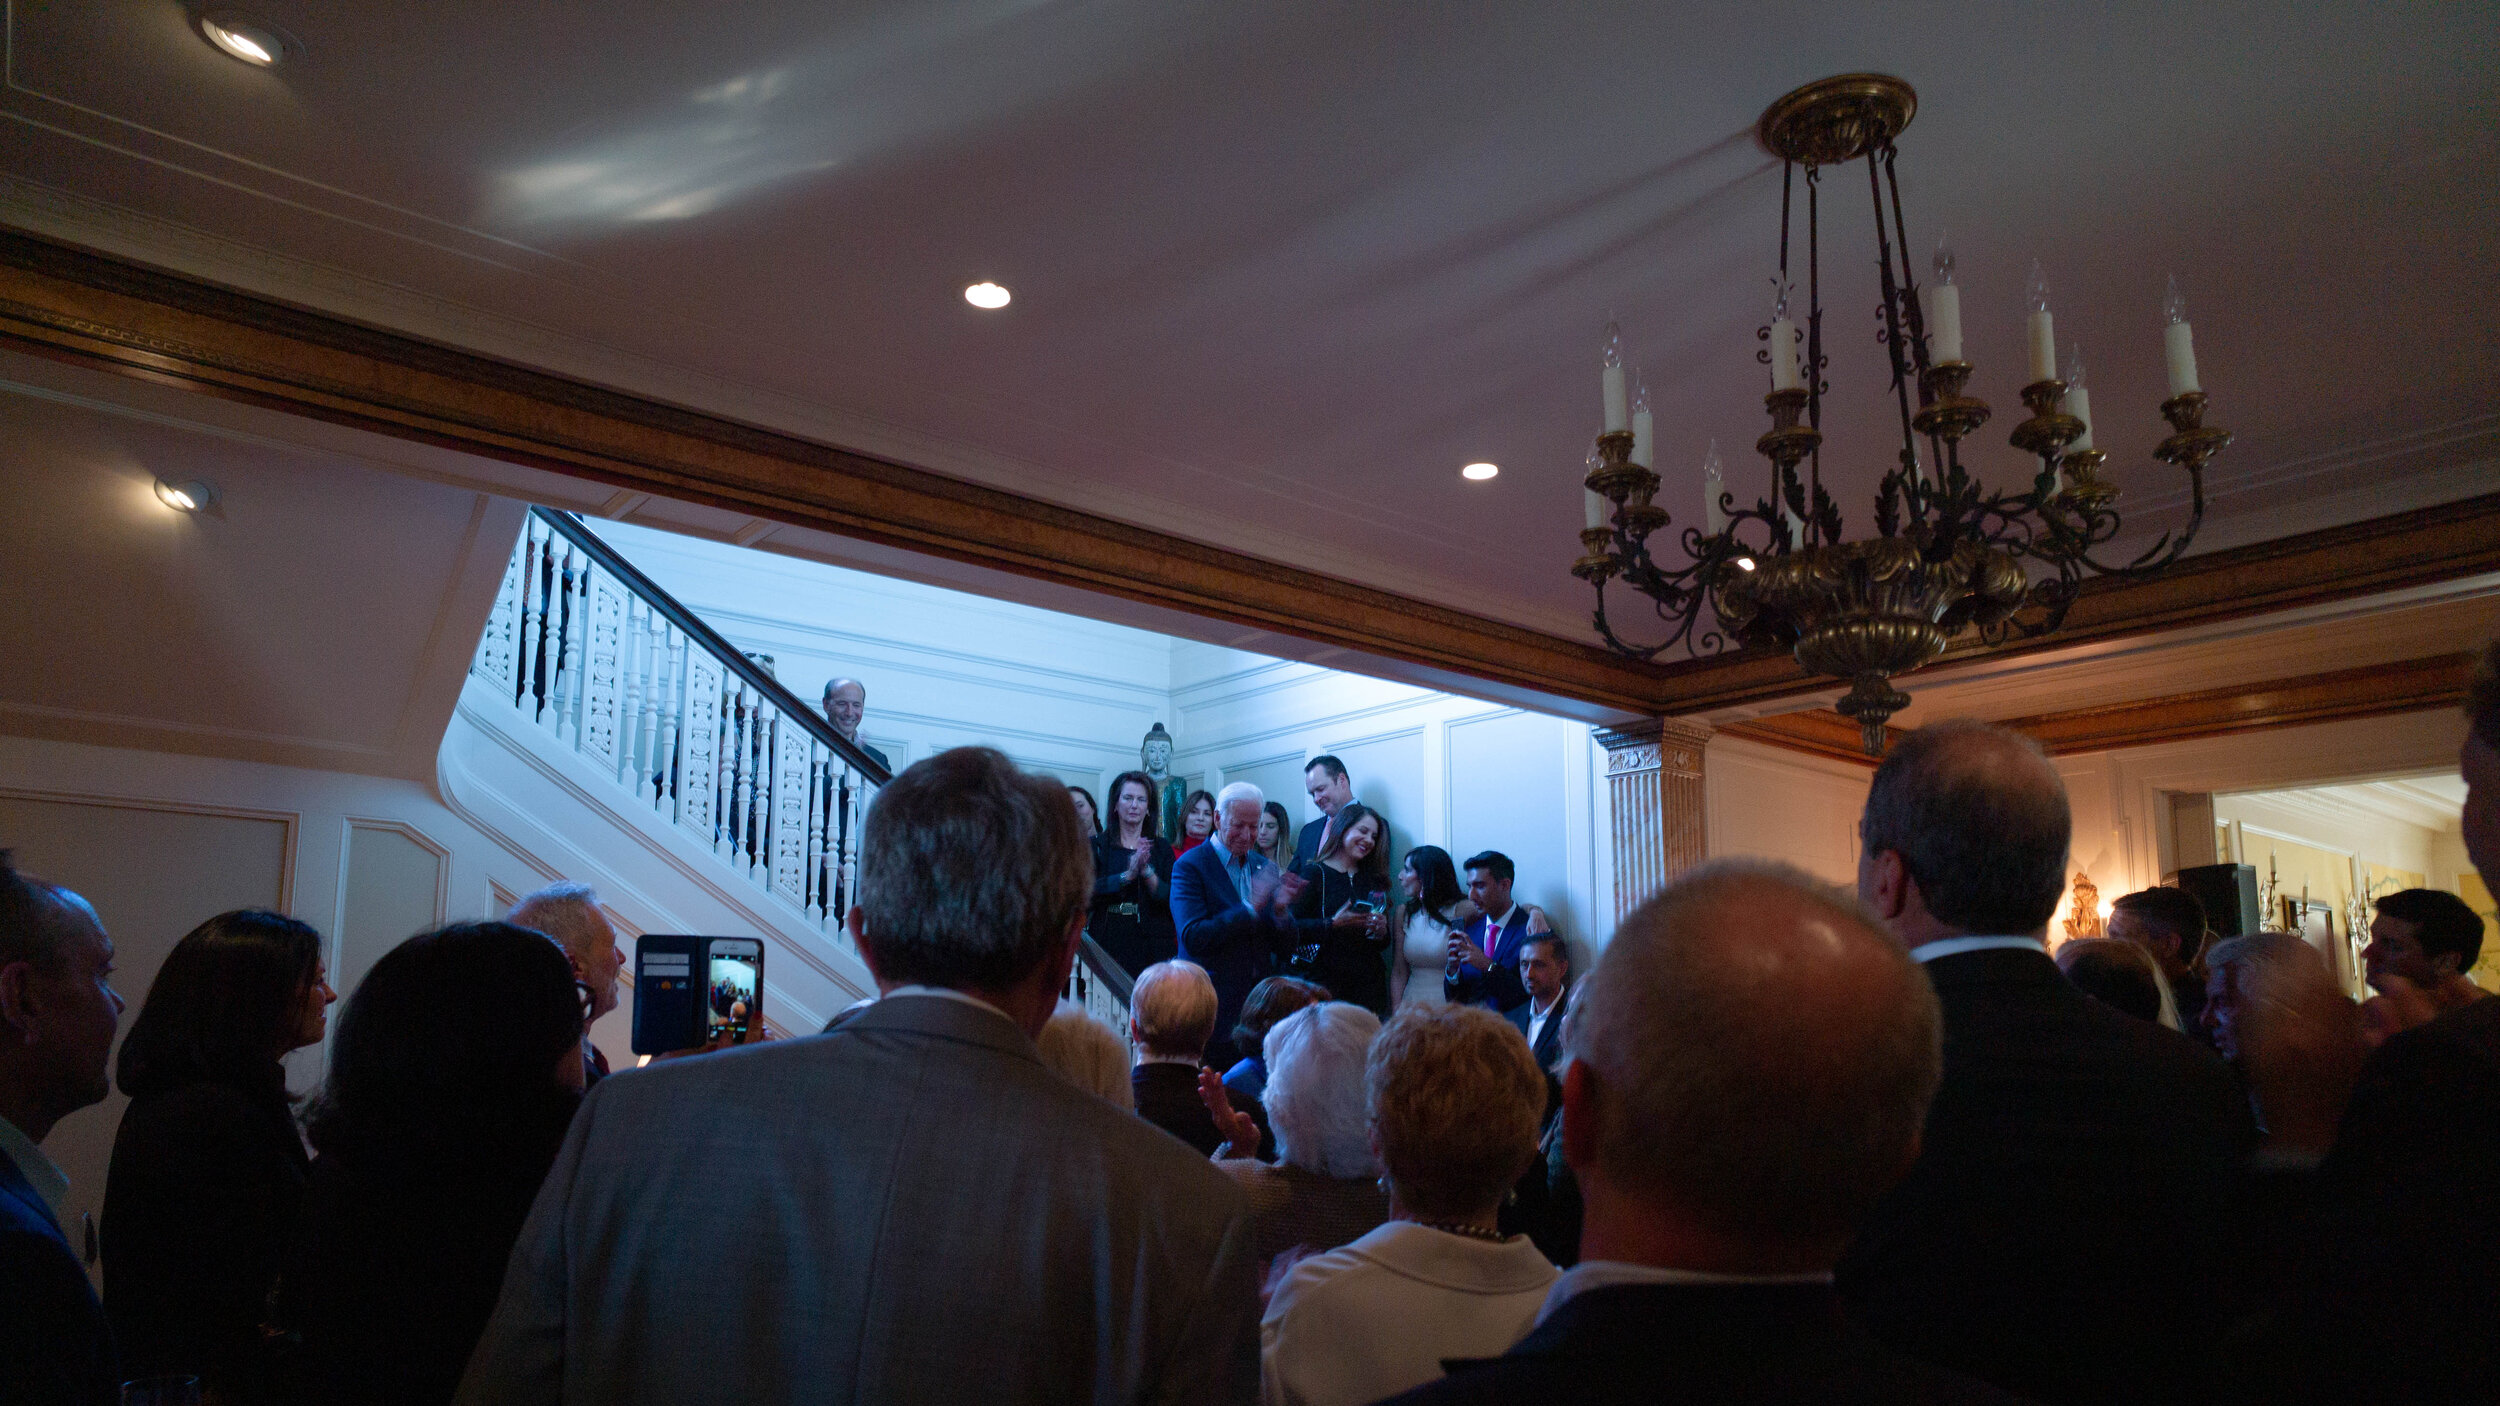 20191003-Biden Fundraiser-4.jpg